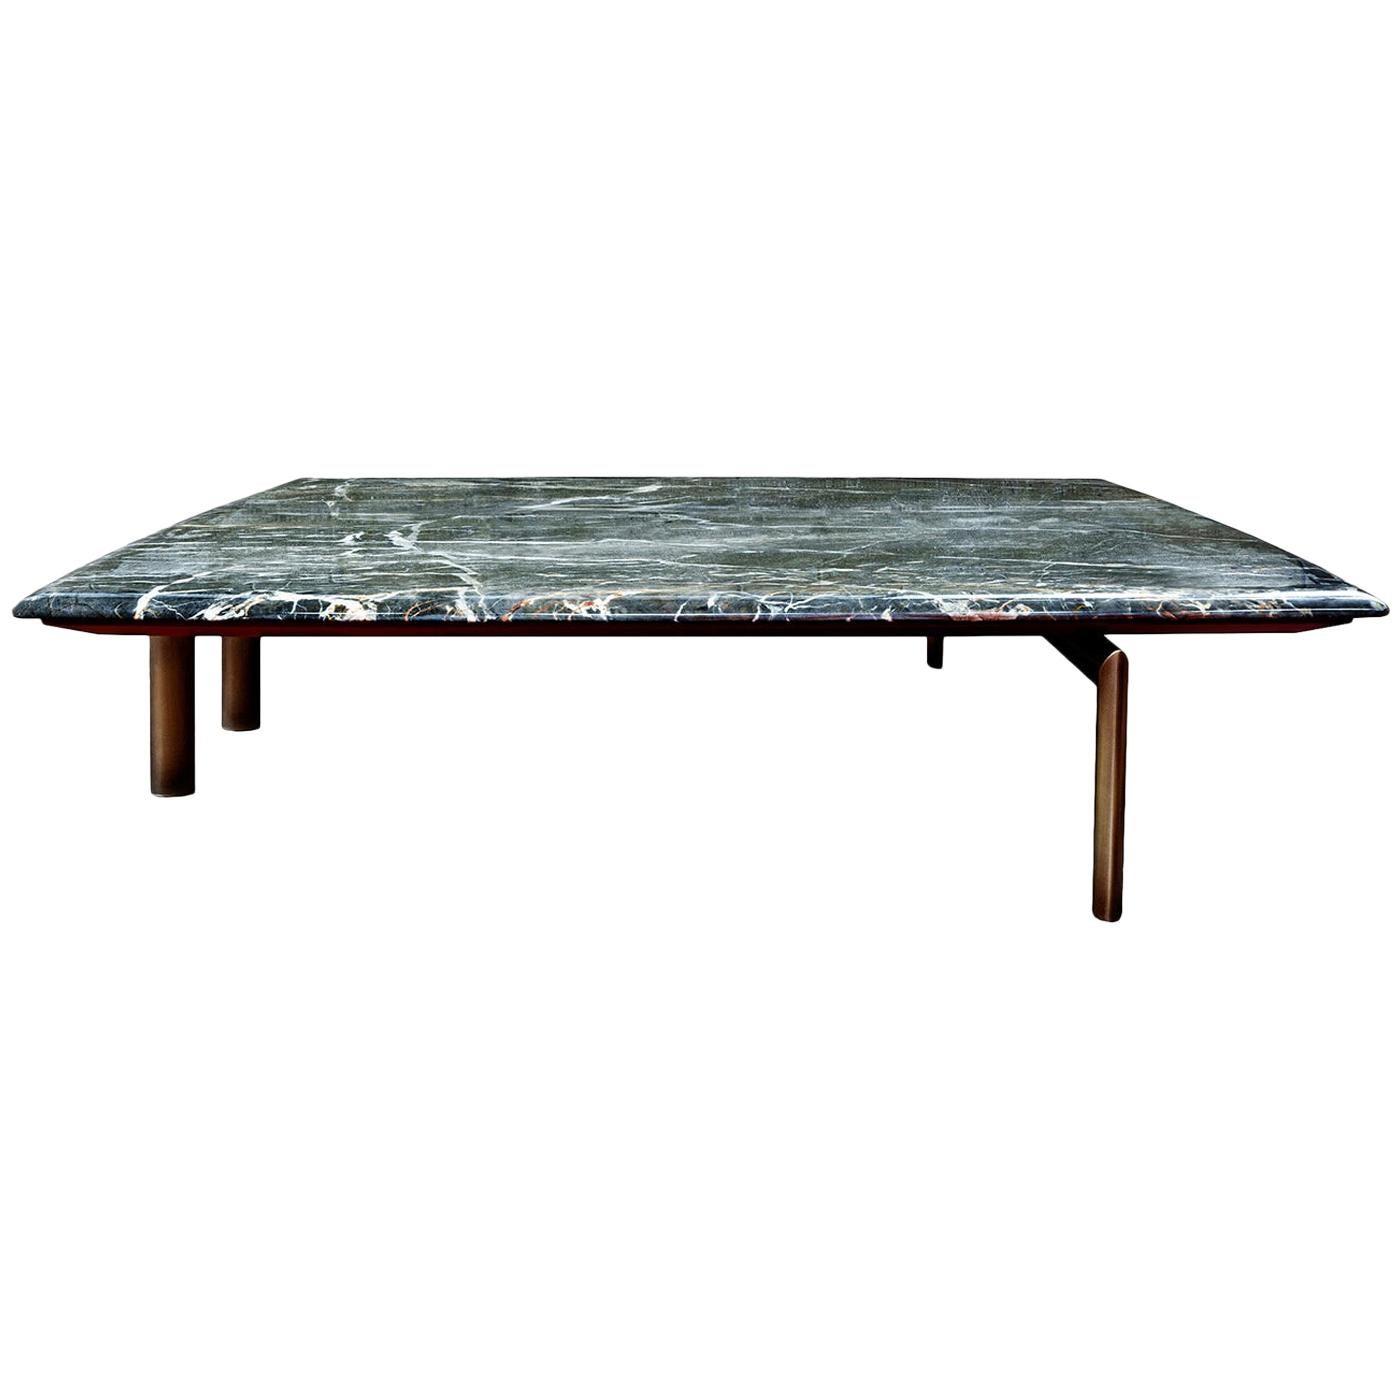 Sasso Gray Marble Coffee Table by Bosco Fair